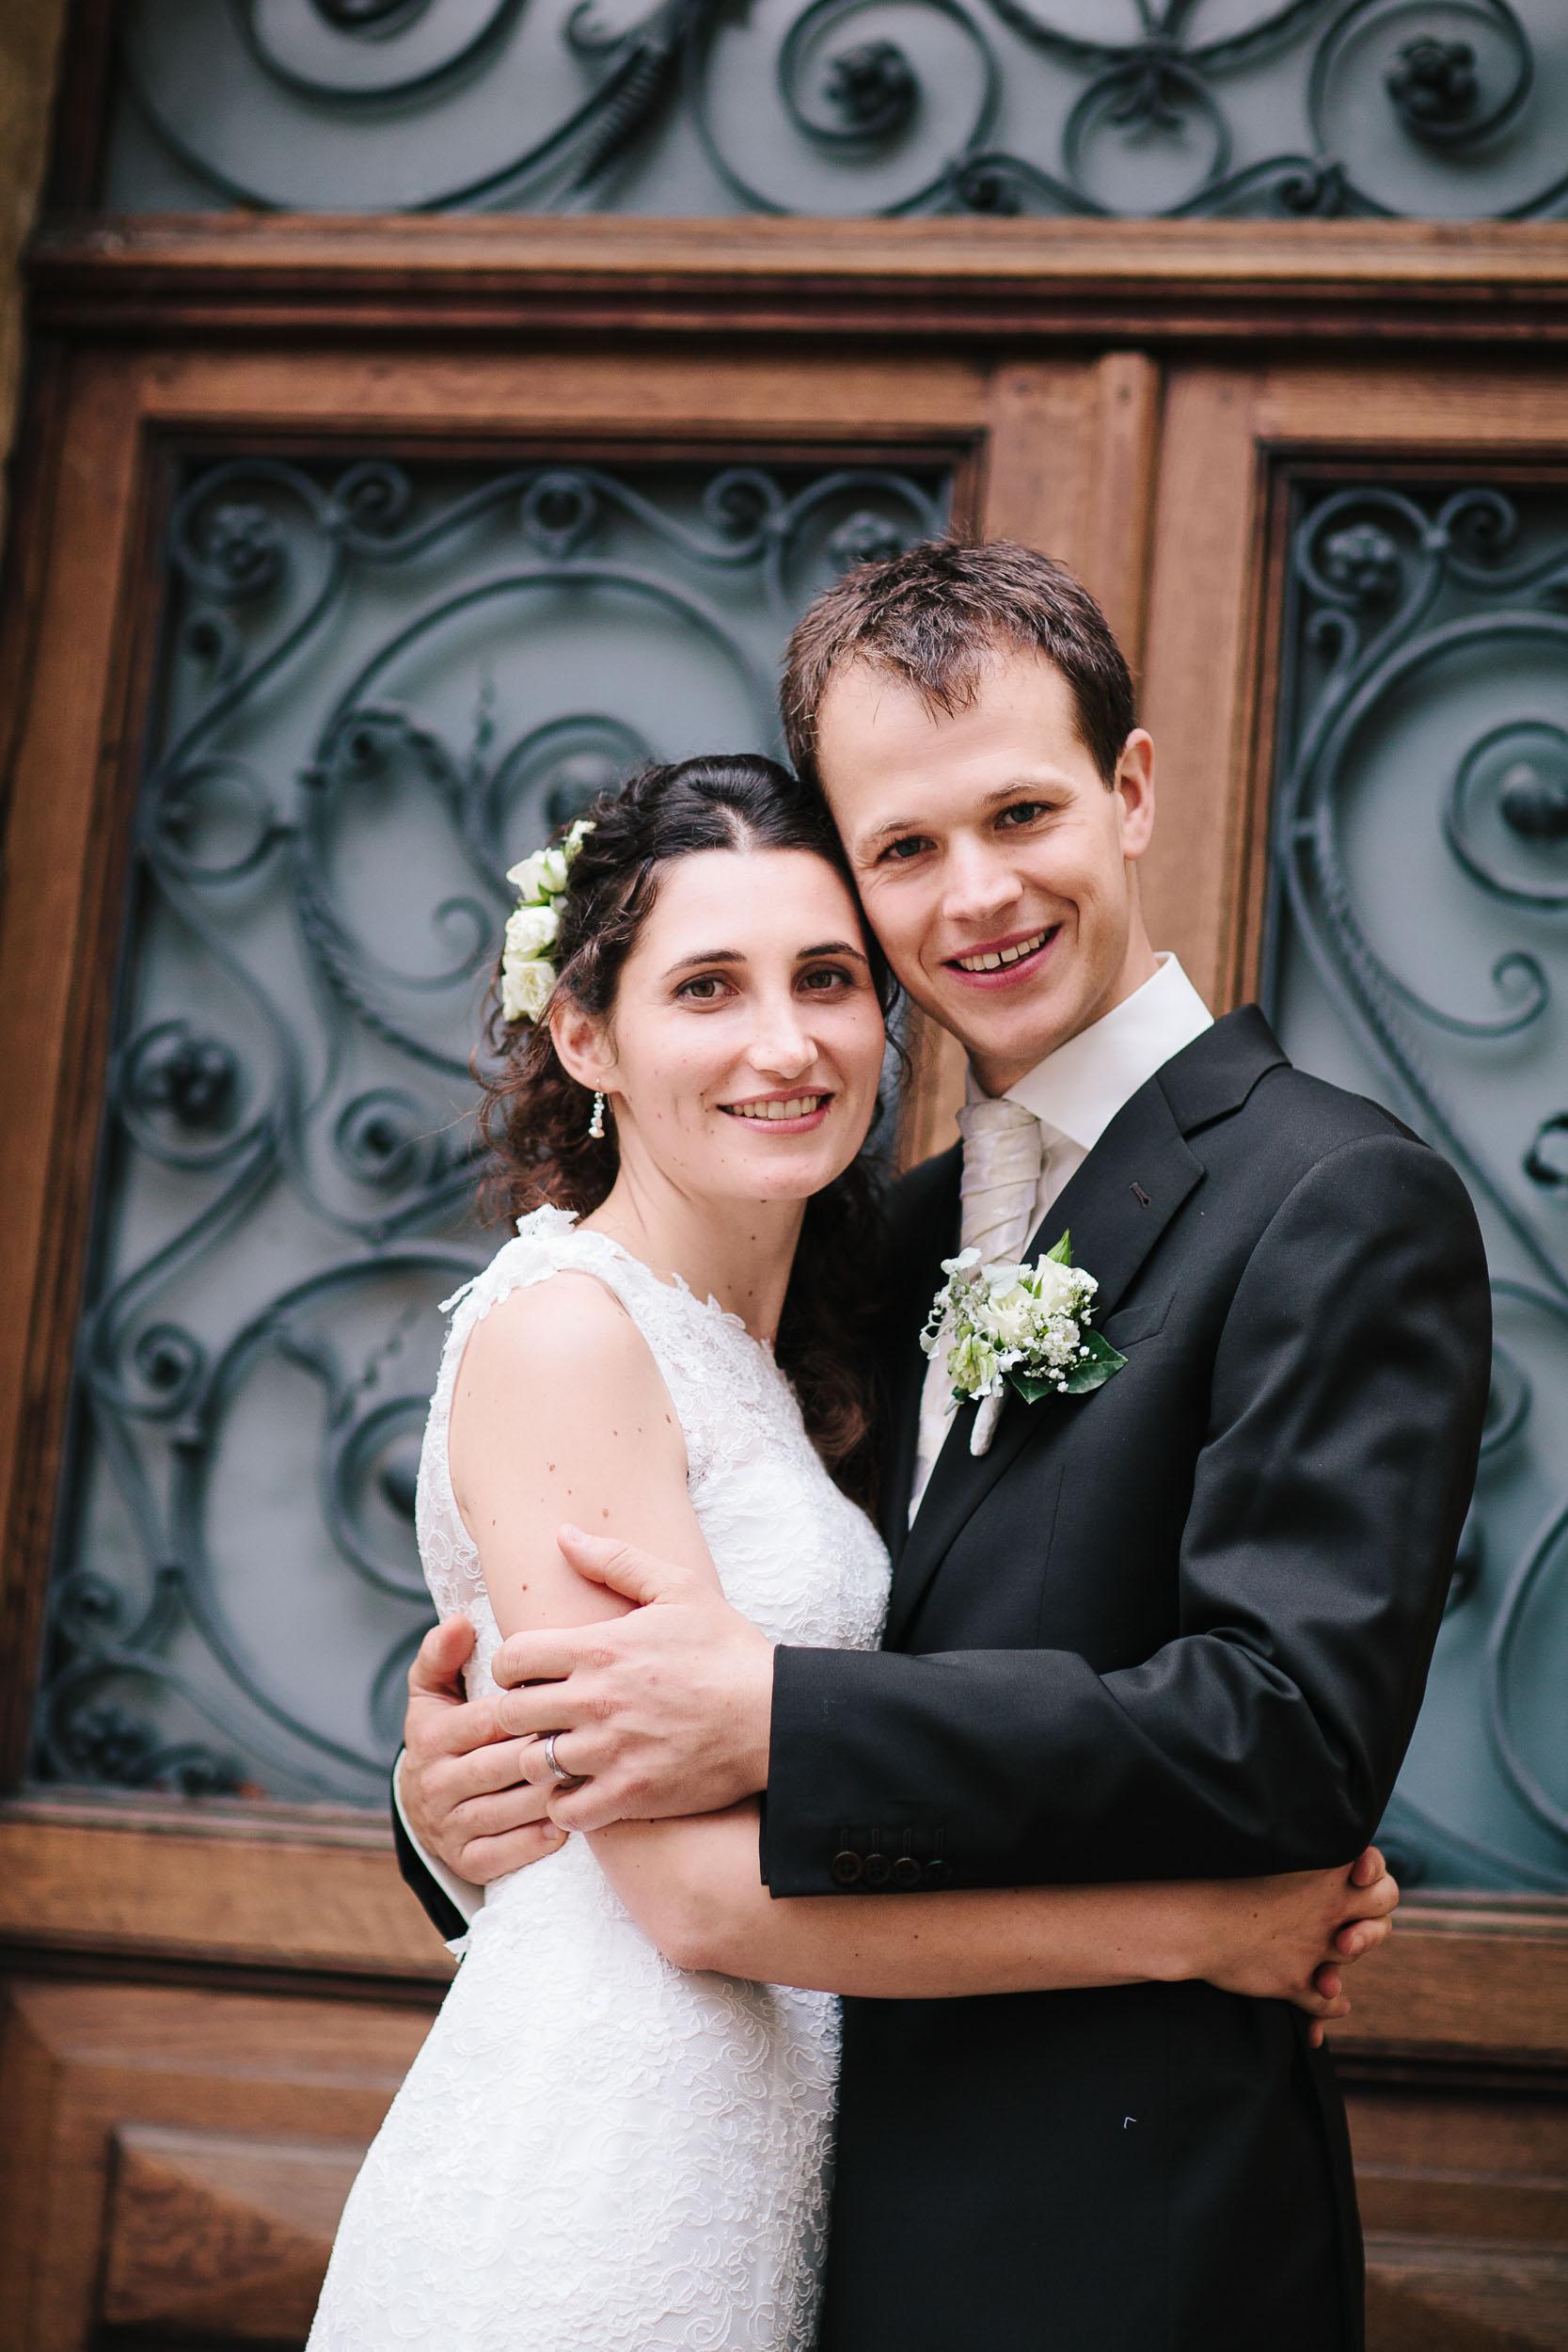 190-Denisa-Lukas-Wedding.jpg